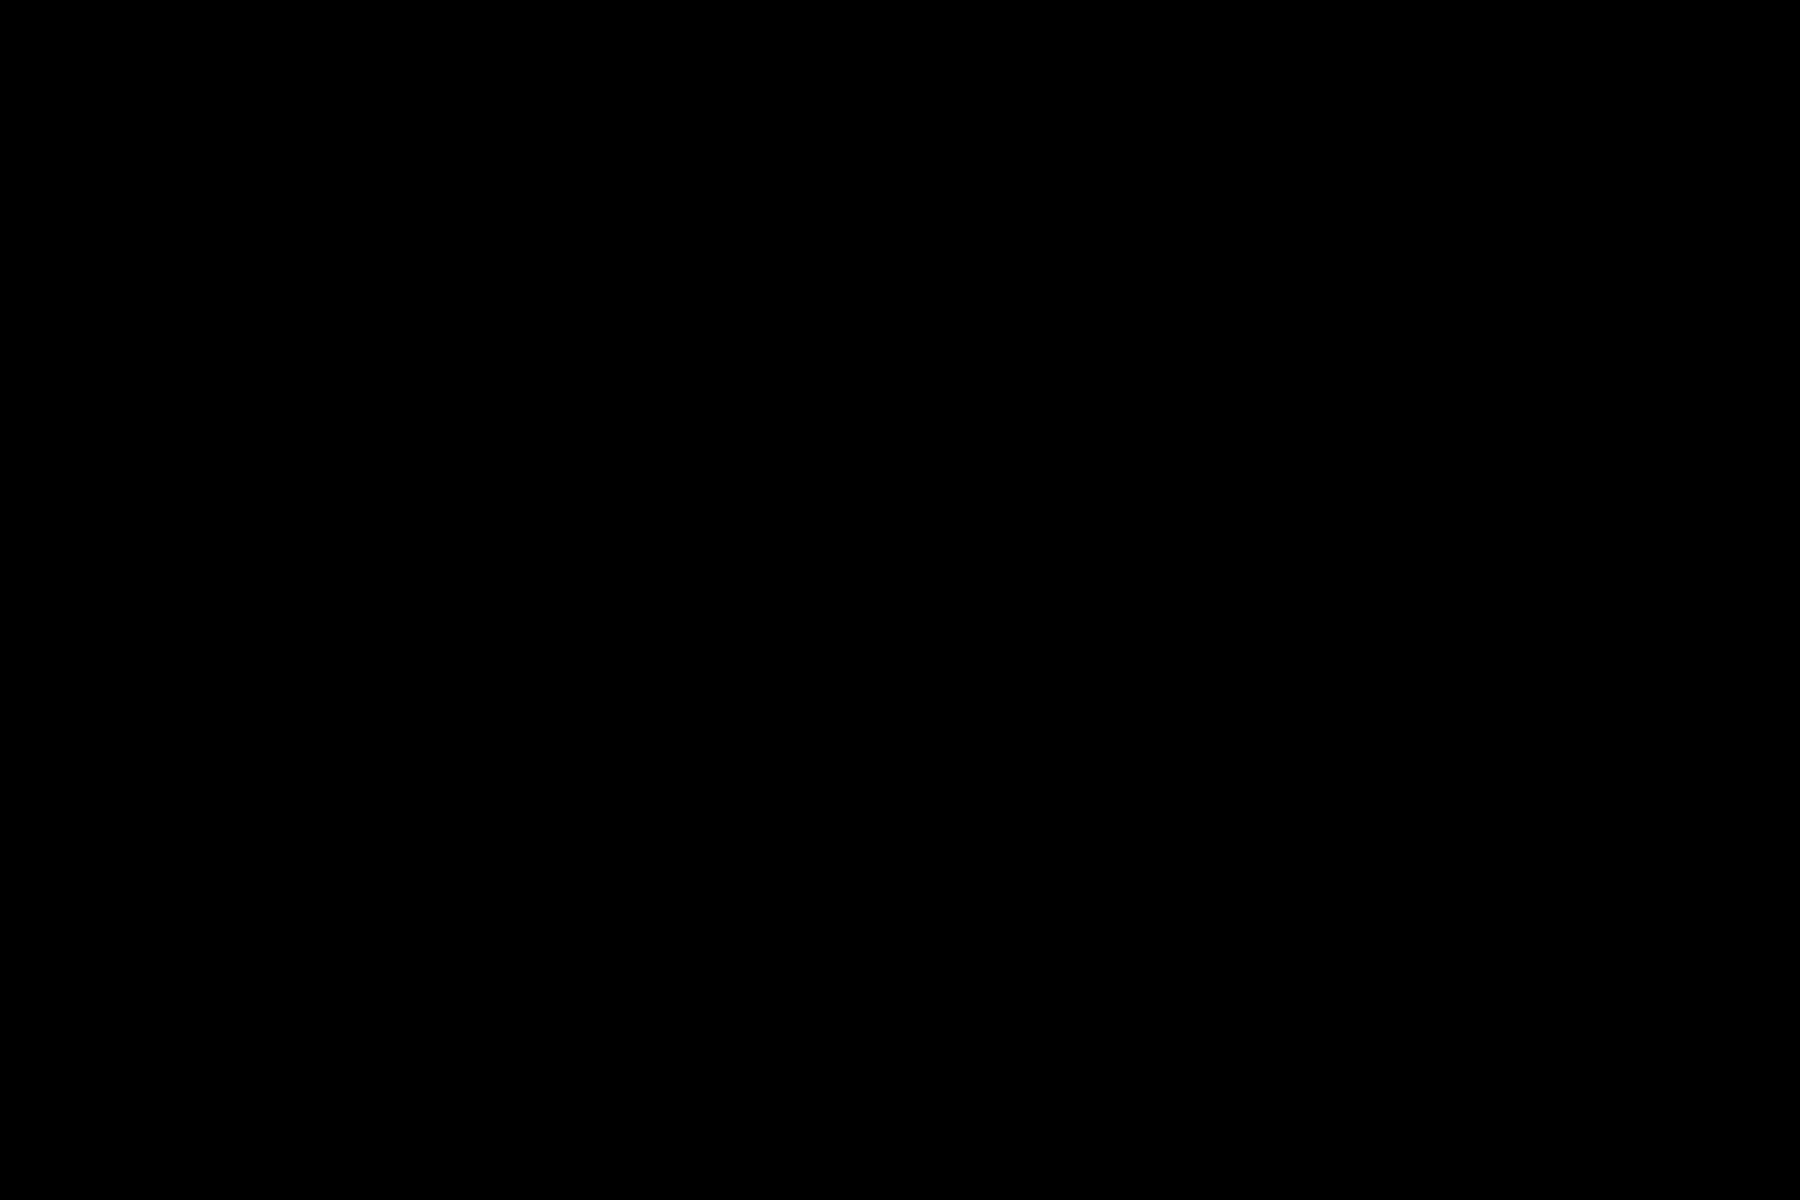 wsi meagon borgman